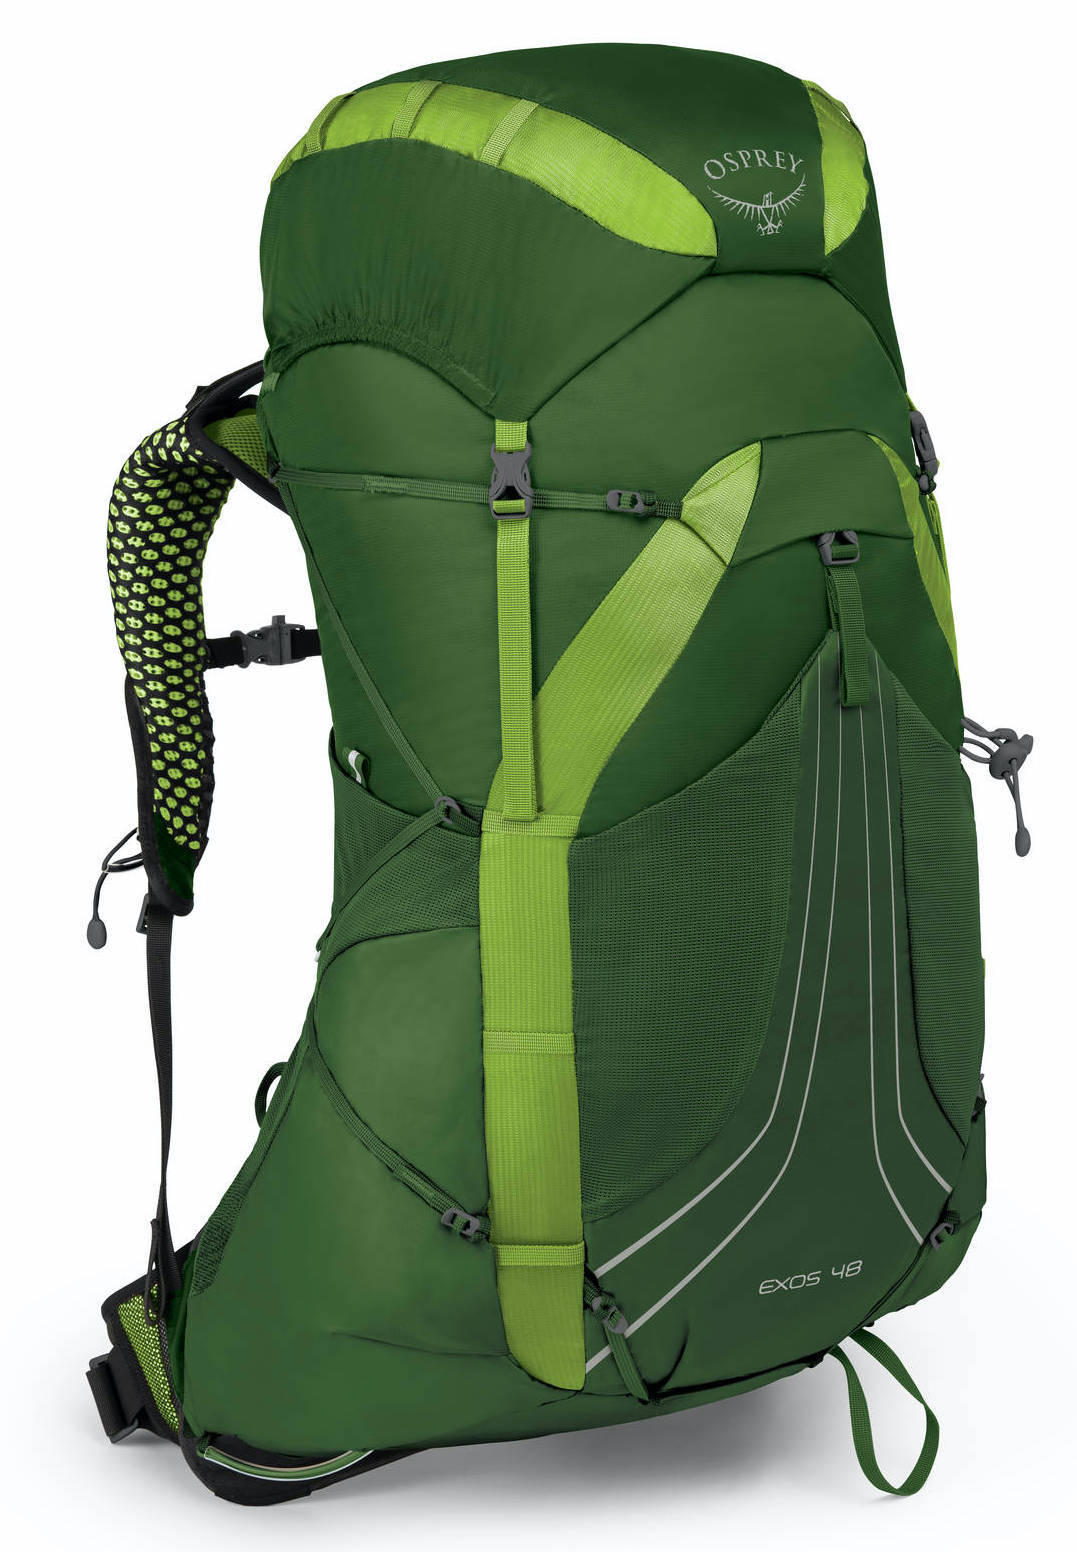 Туристические рюкзаки Рюкзак Osprey Exos 48 Tunnel Green Exos48_S18_Side_TunnelGreen_web.jpg